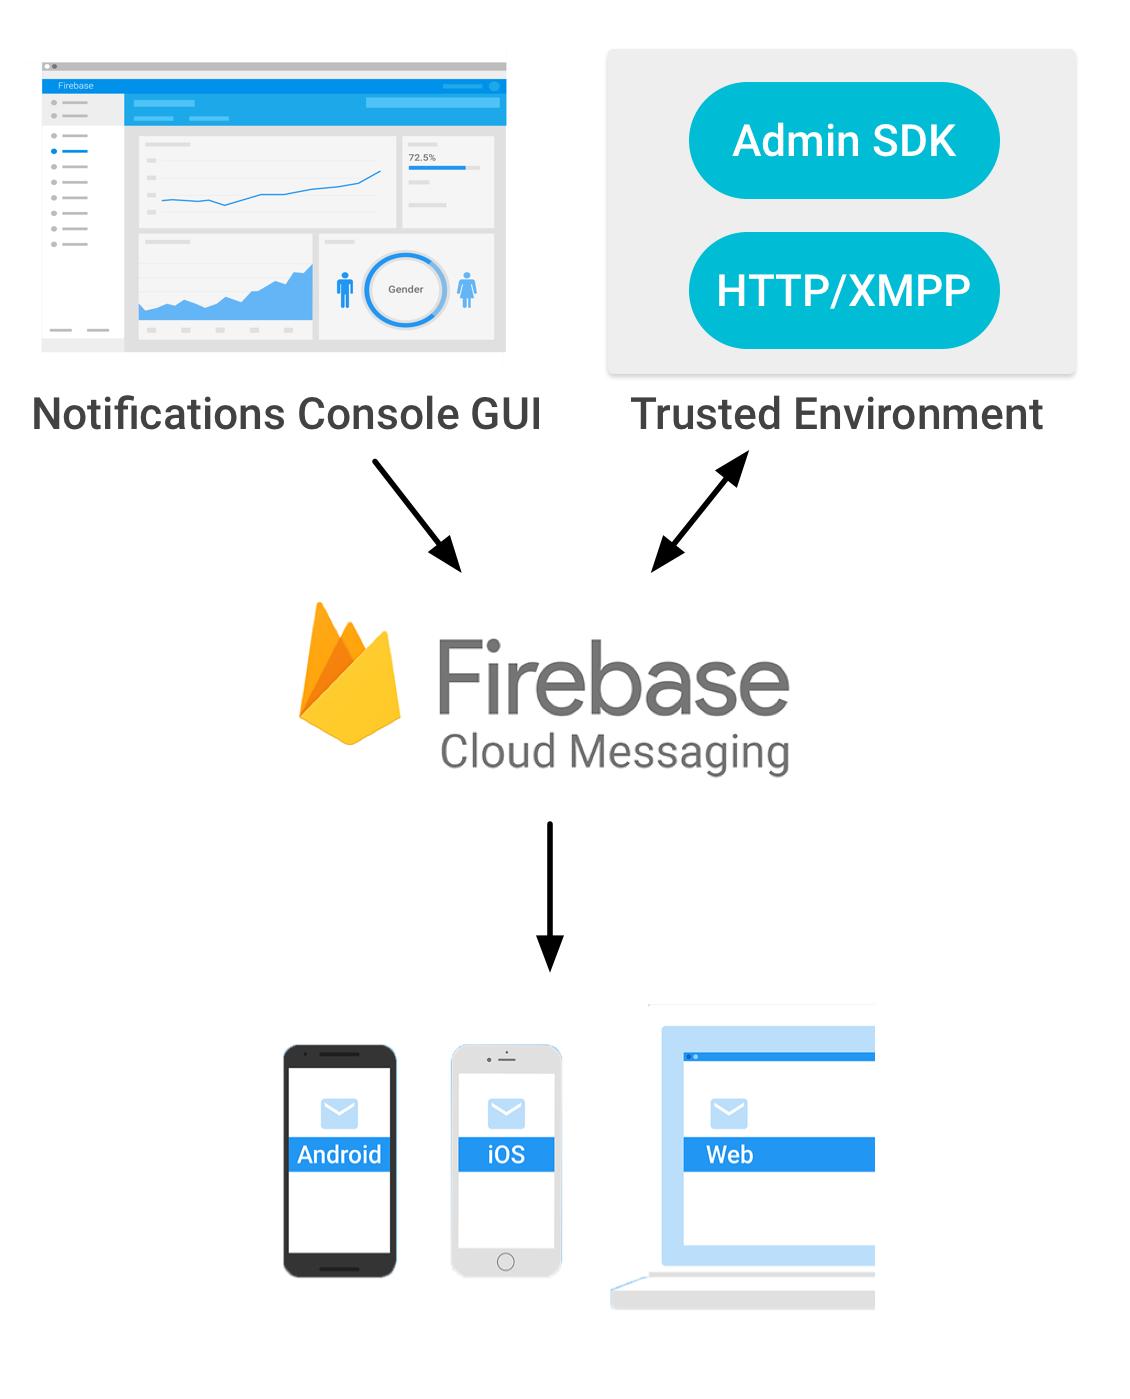 Firebase Cloud Messaging architecture diagram